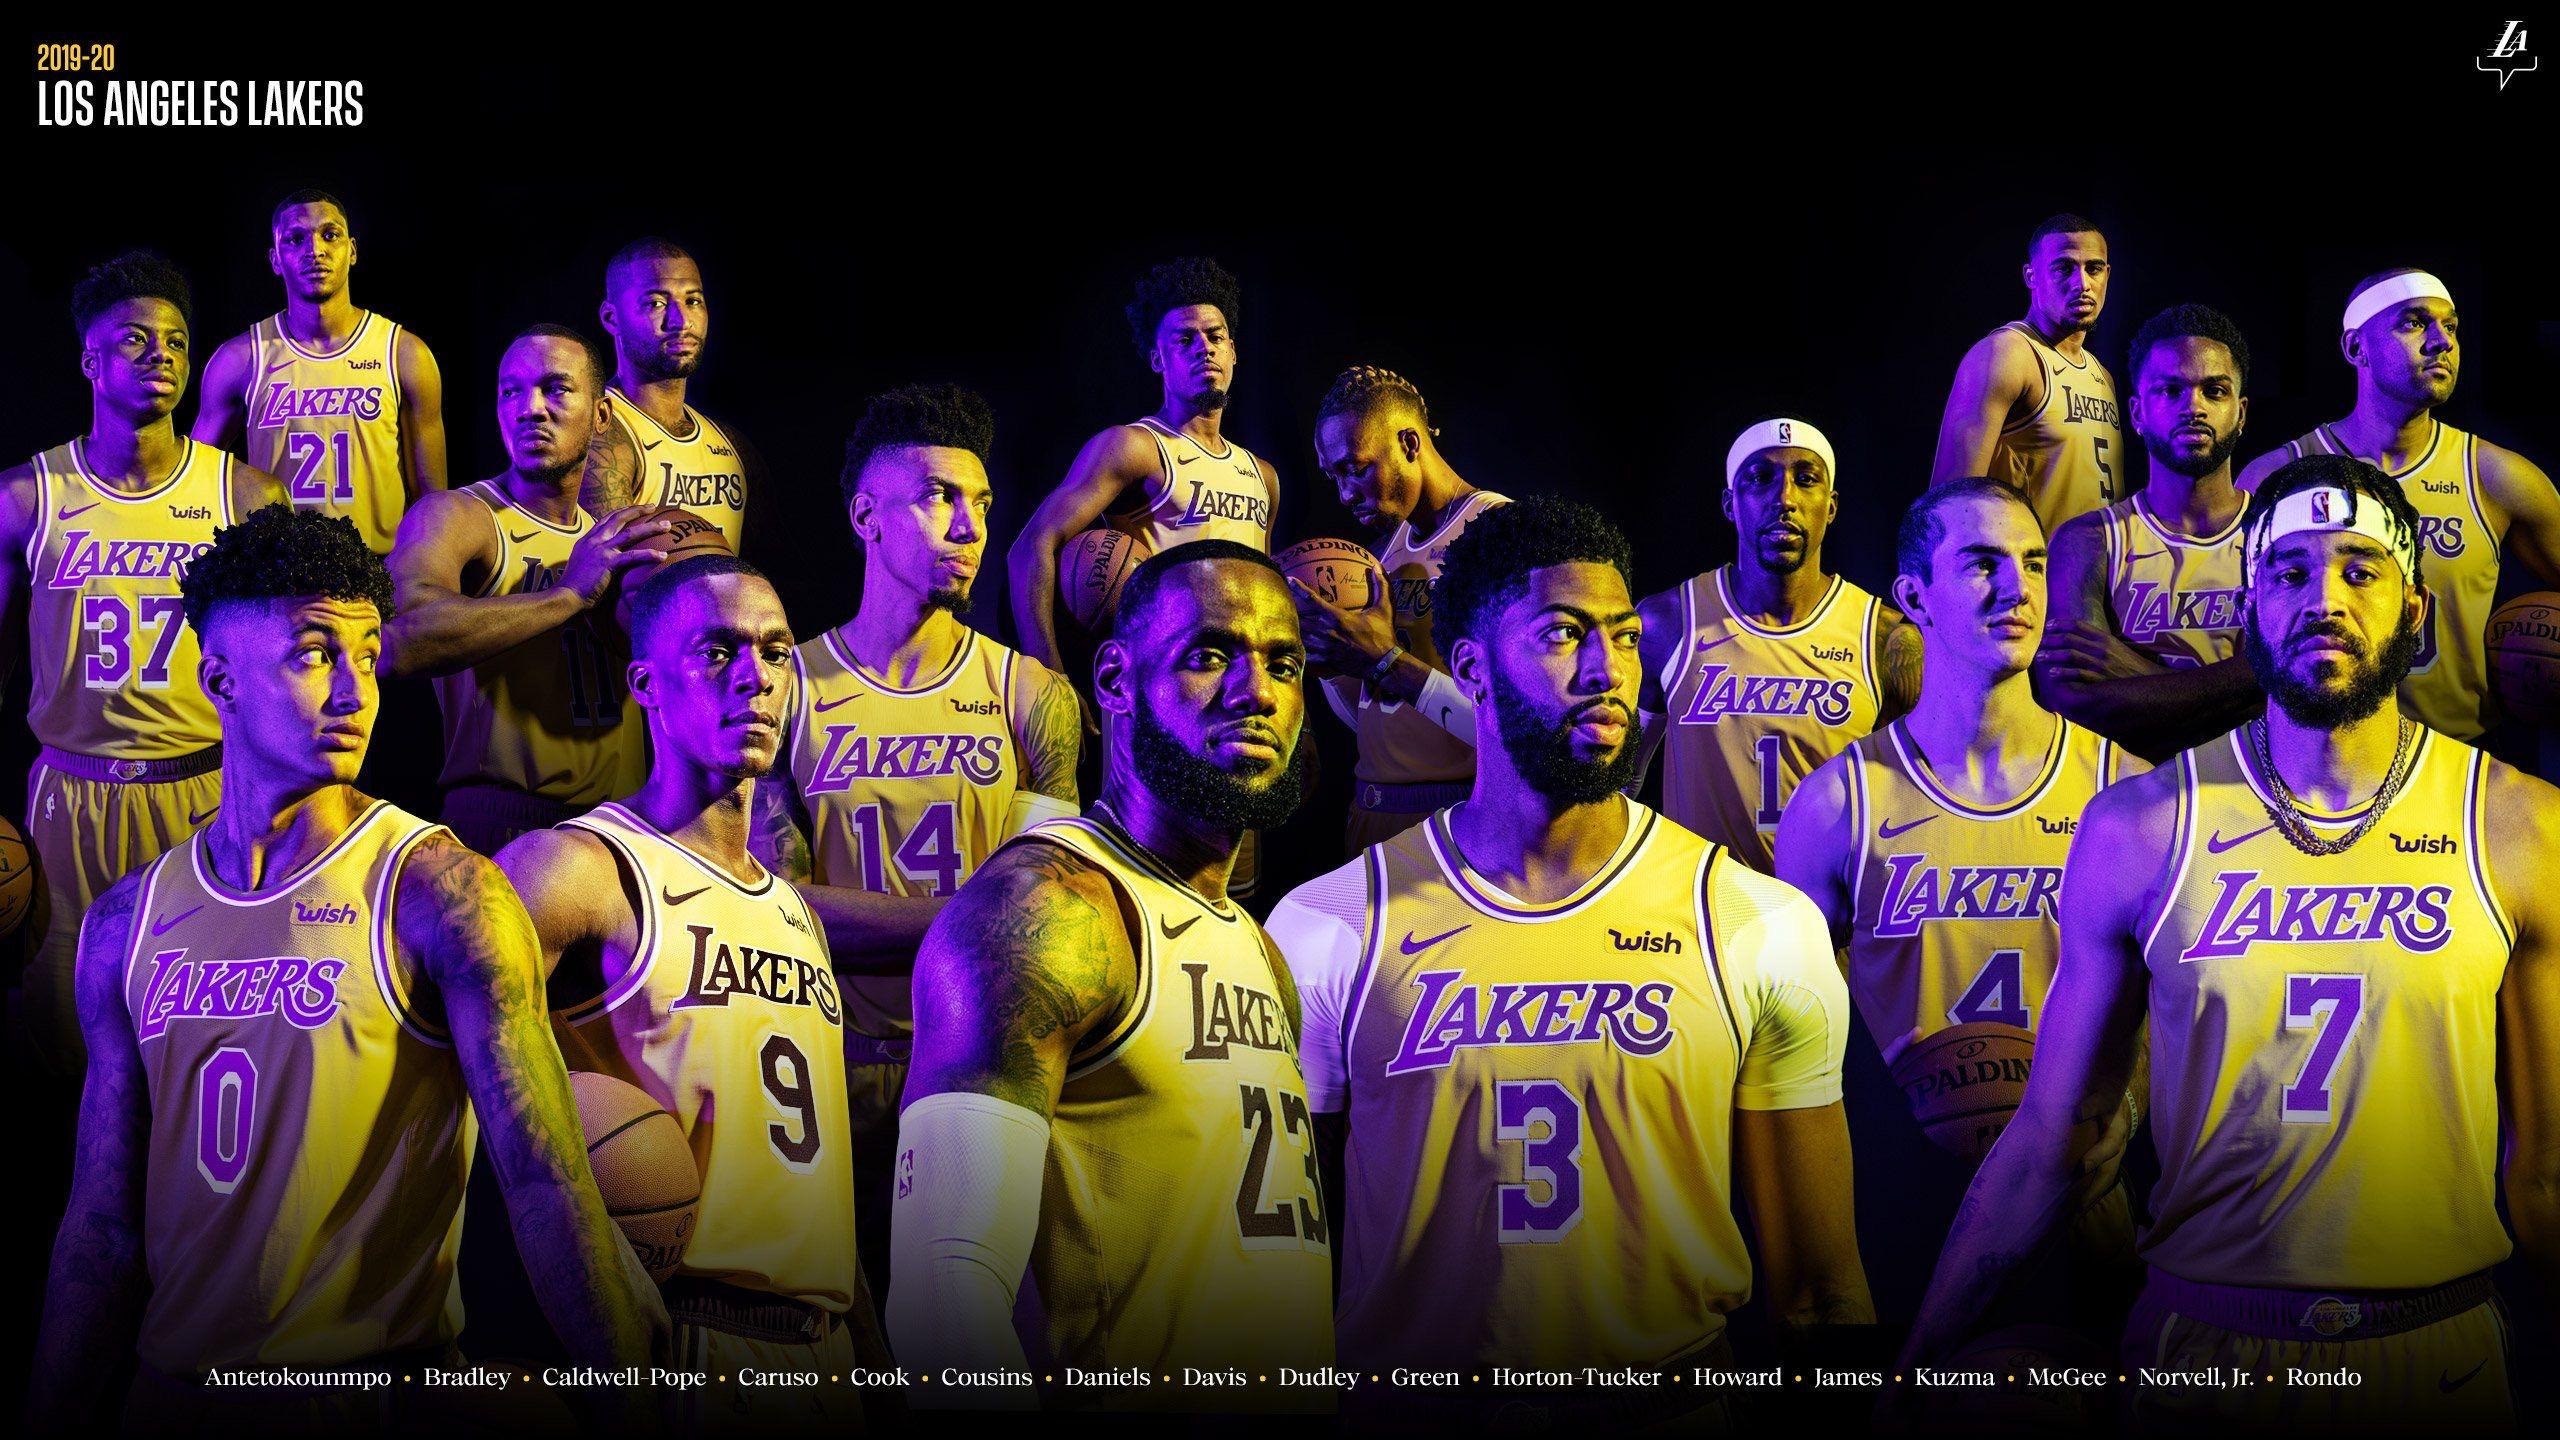 Los Angeles Lakers 20192020 Lakers wallpaper, Los